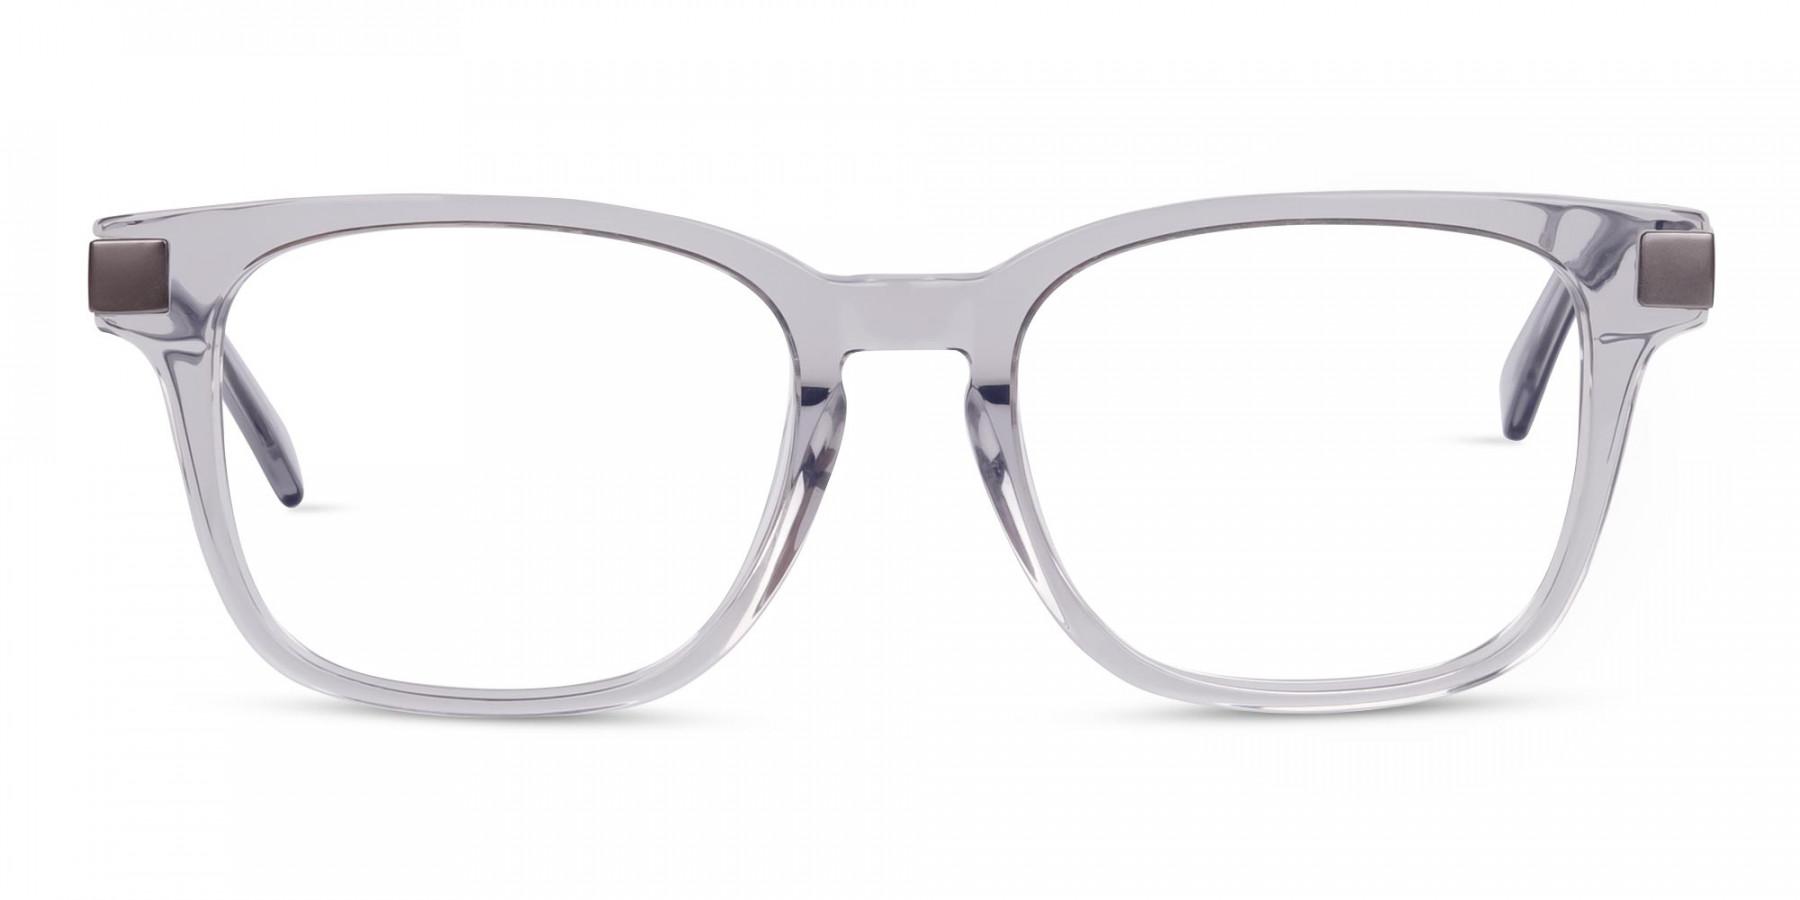 Crystal-and-Grey-Wayfarer-Glasses-1